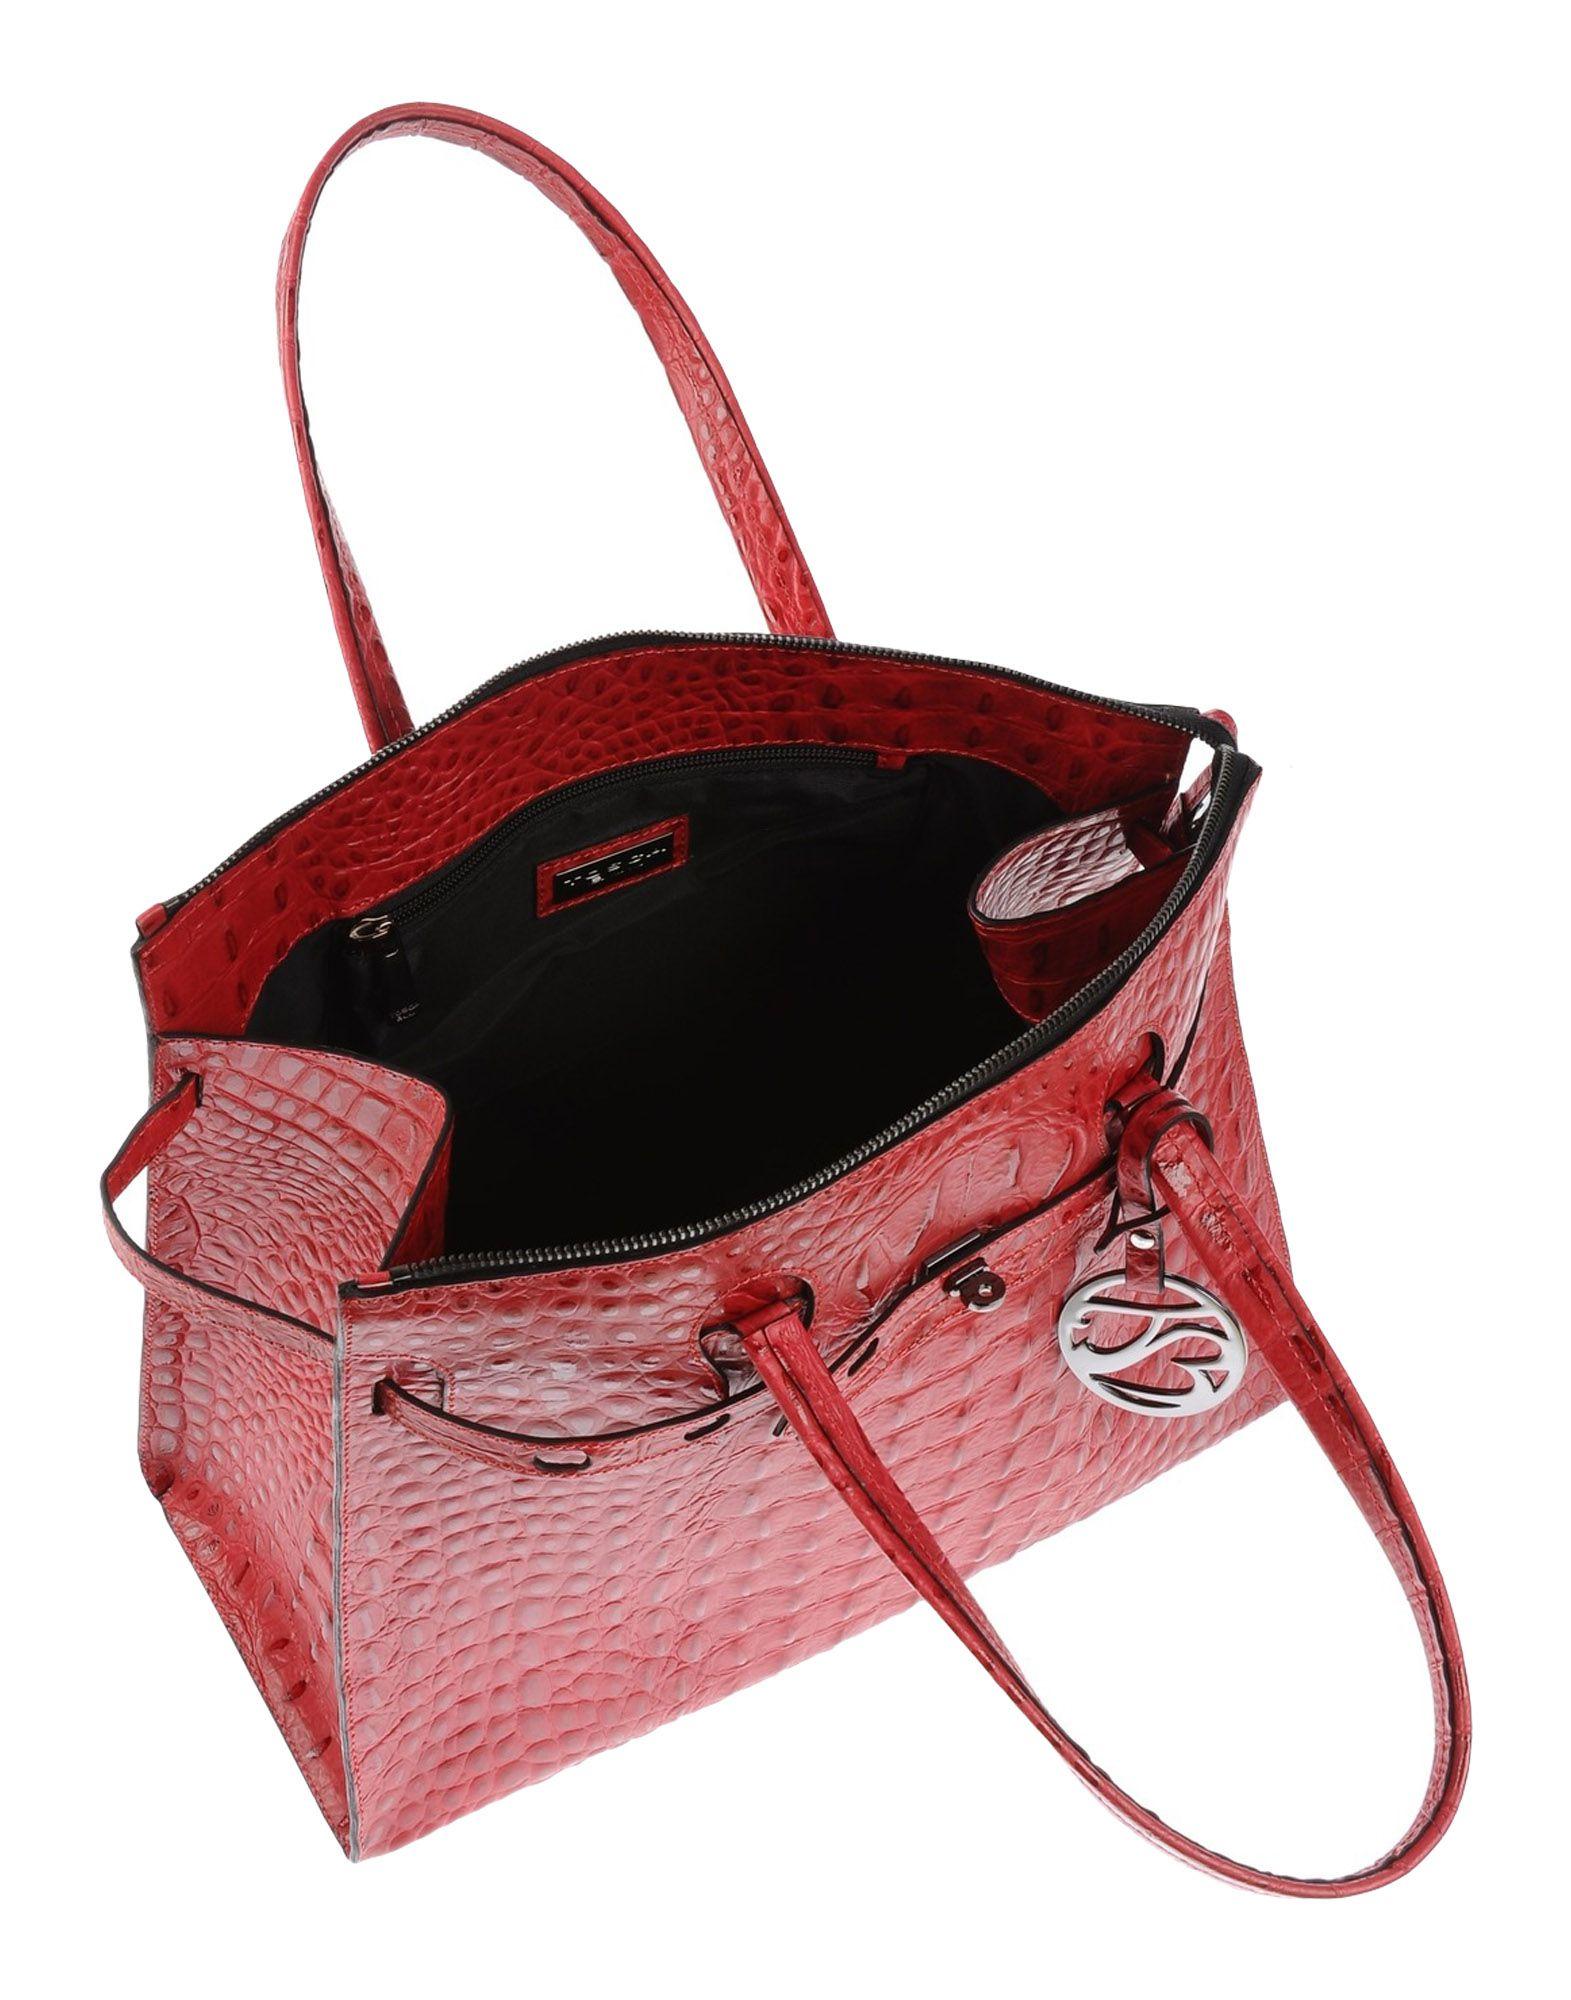 Lyst Tosca Blu Handbag In Red